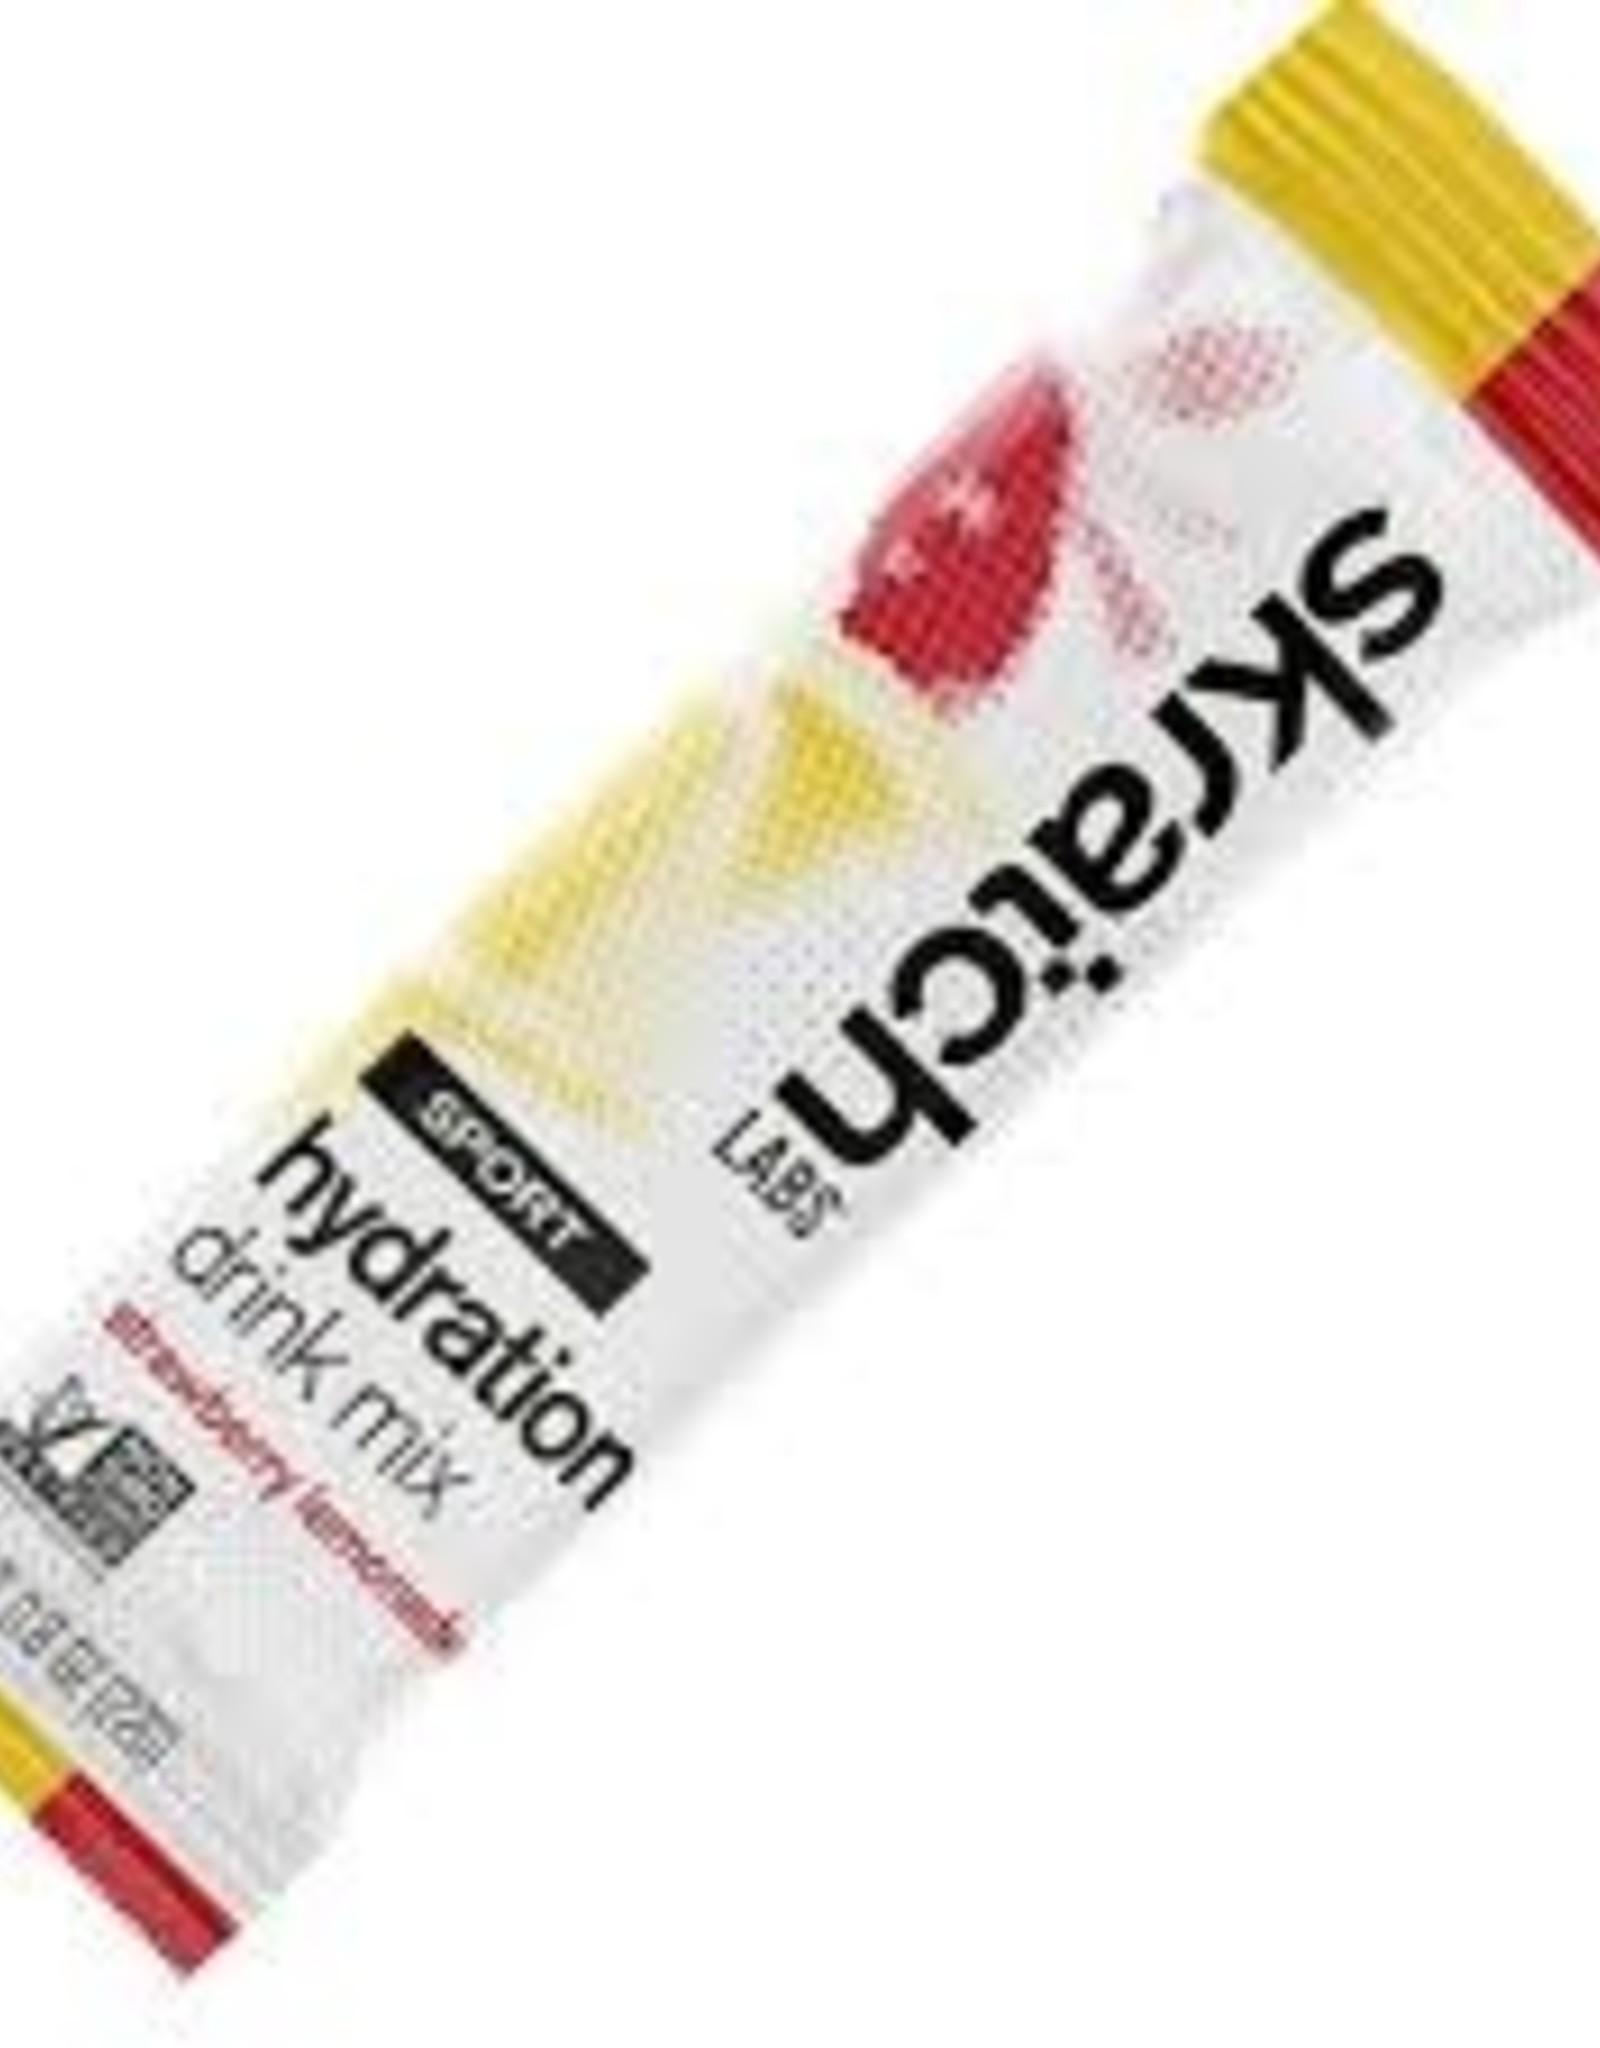 Skratch Sport Hydration Drink single serving